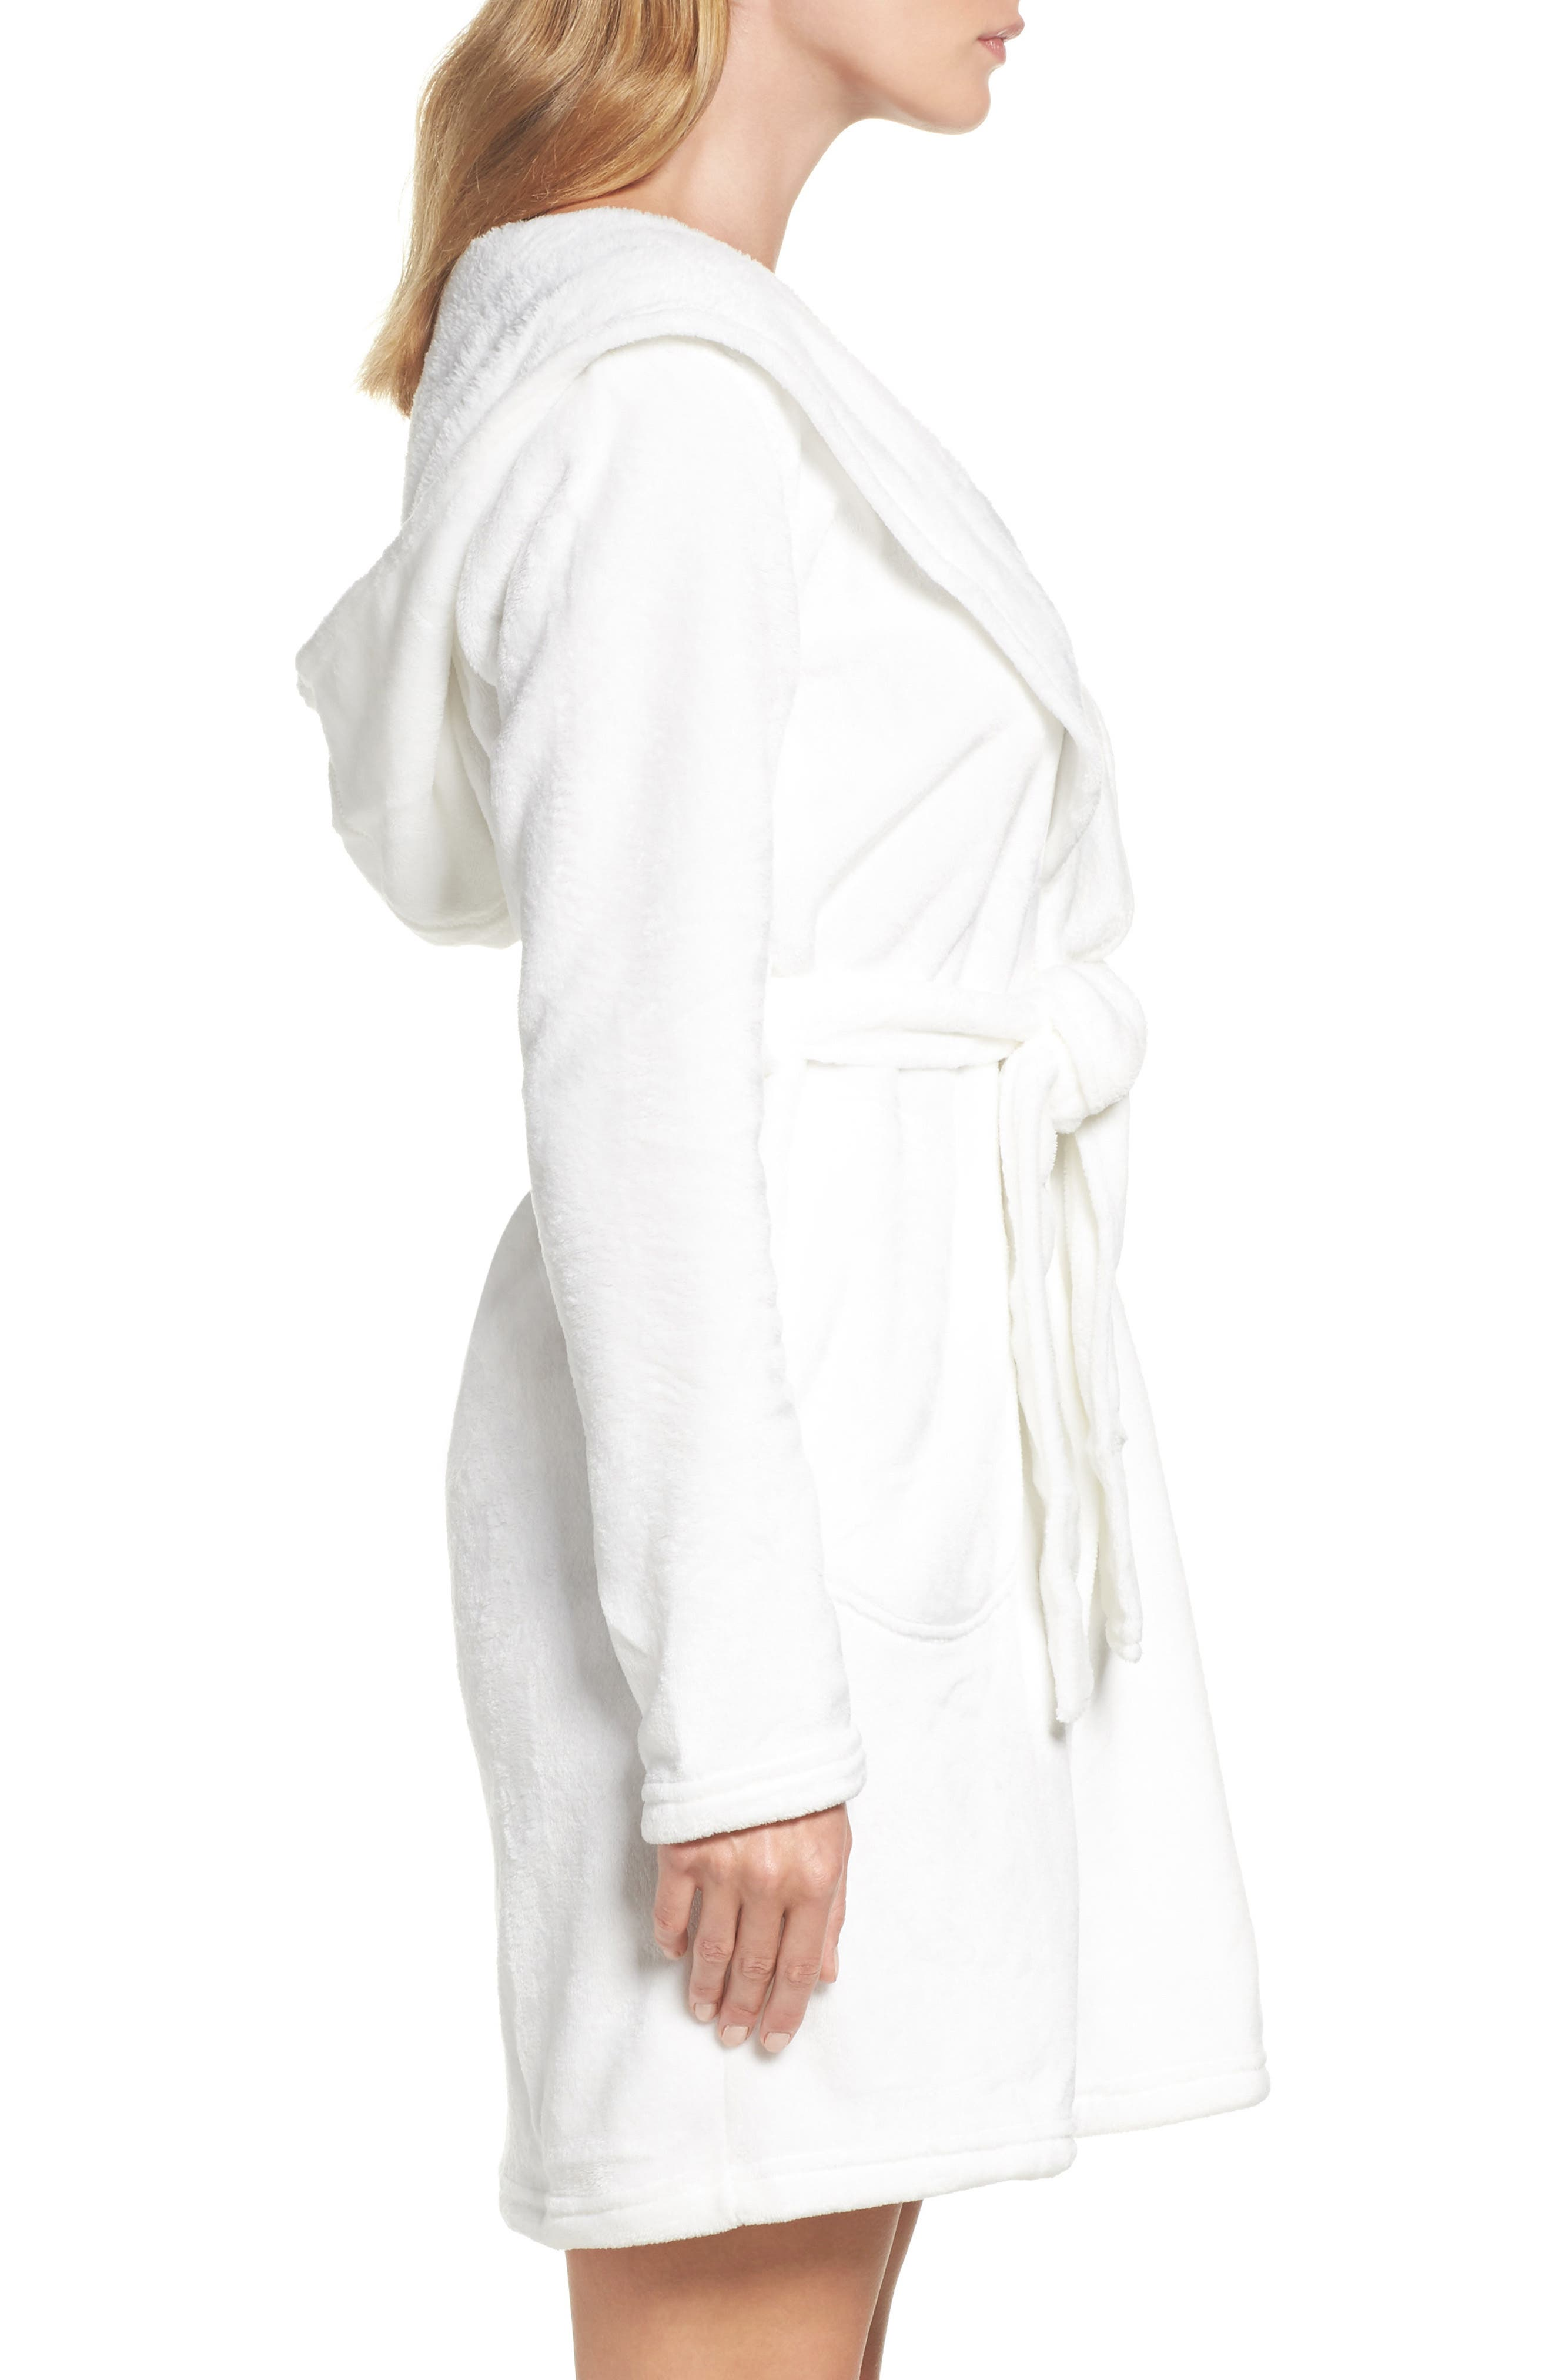 Australia'Miranda' Robe,                             Alternate thumbnail 3, color,                             Seagull